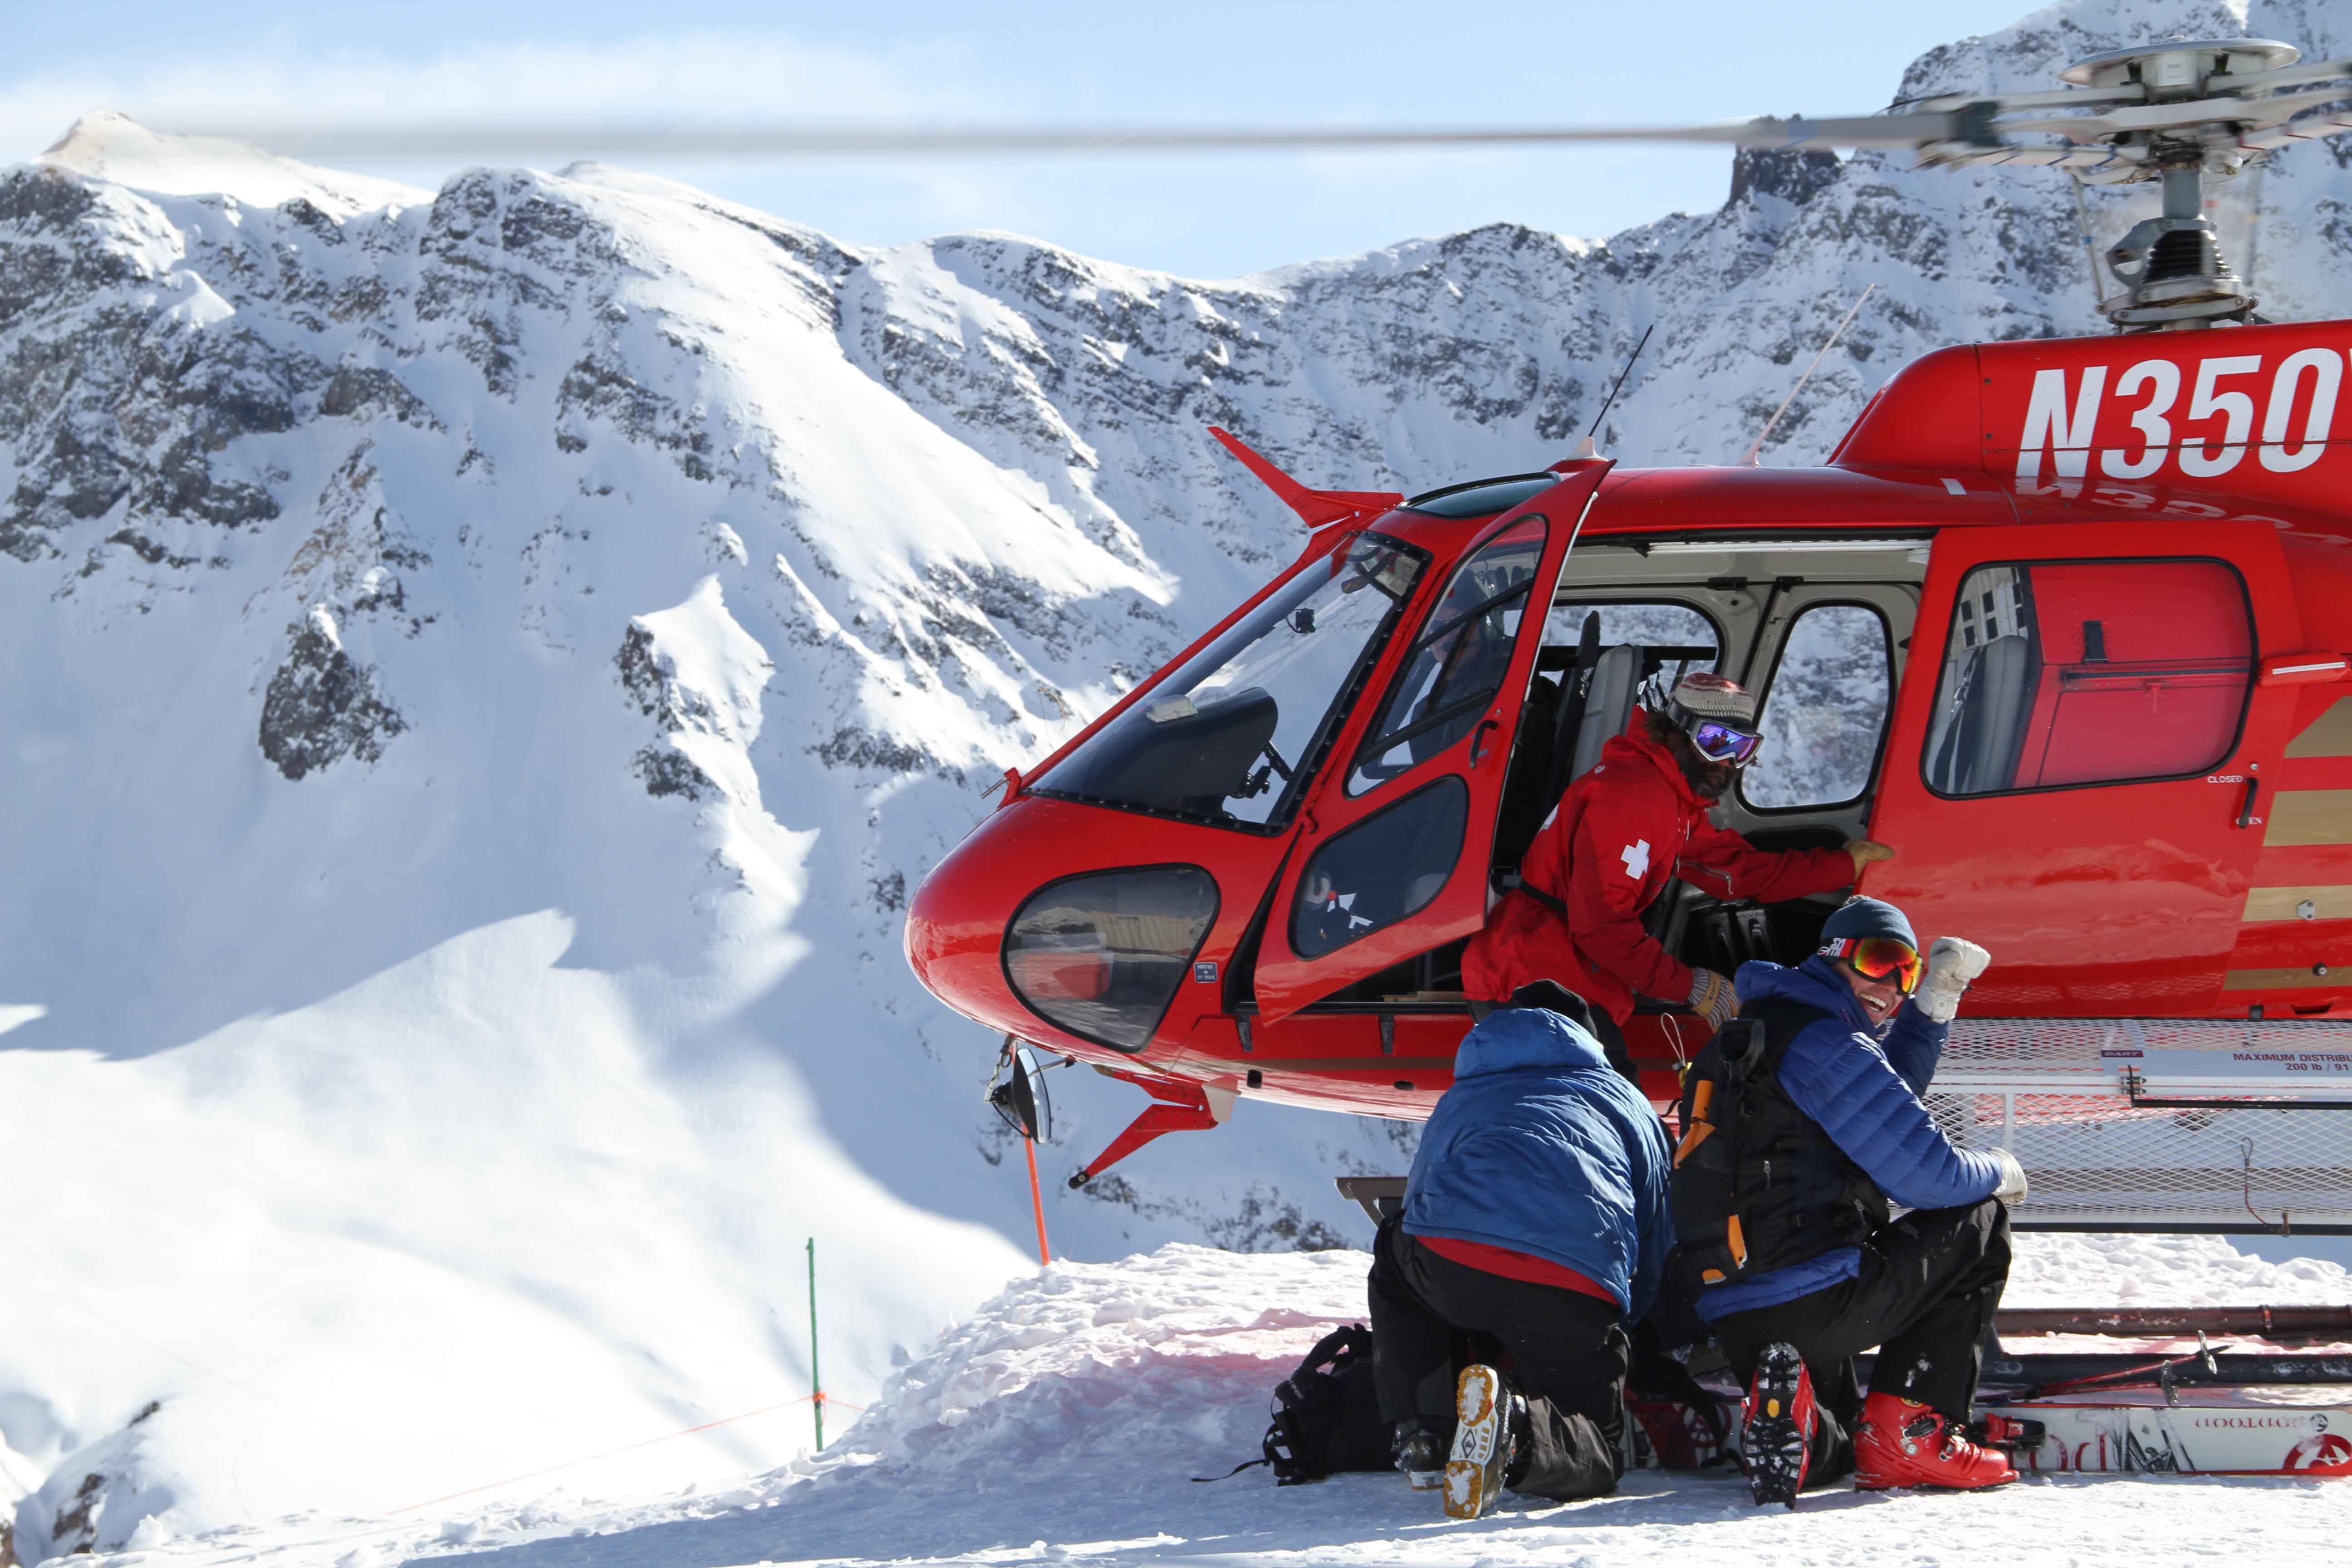 Heli-Skiing At Silverton Mountain